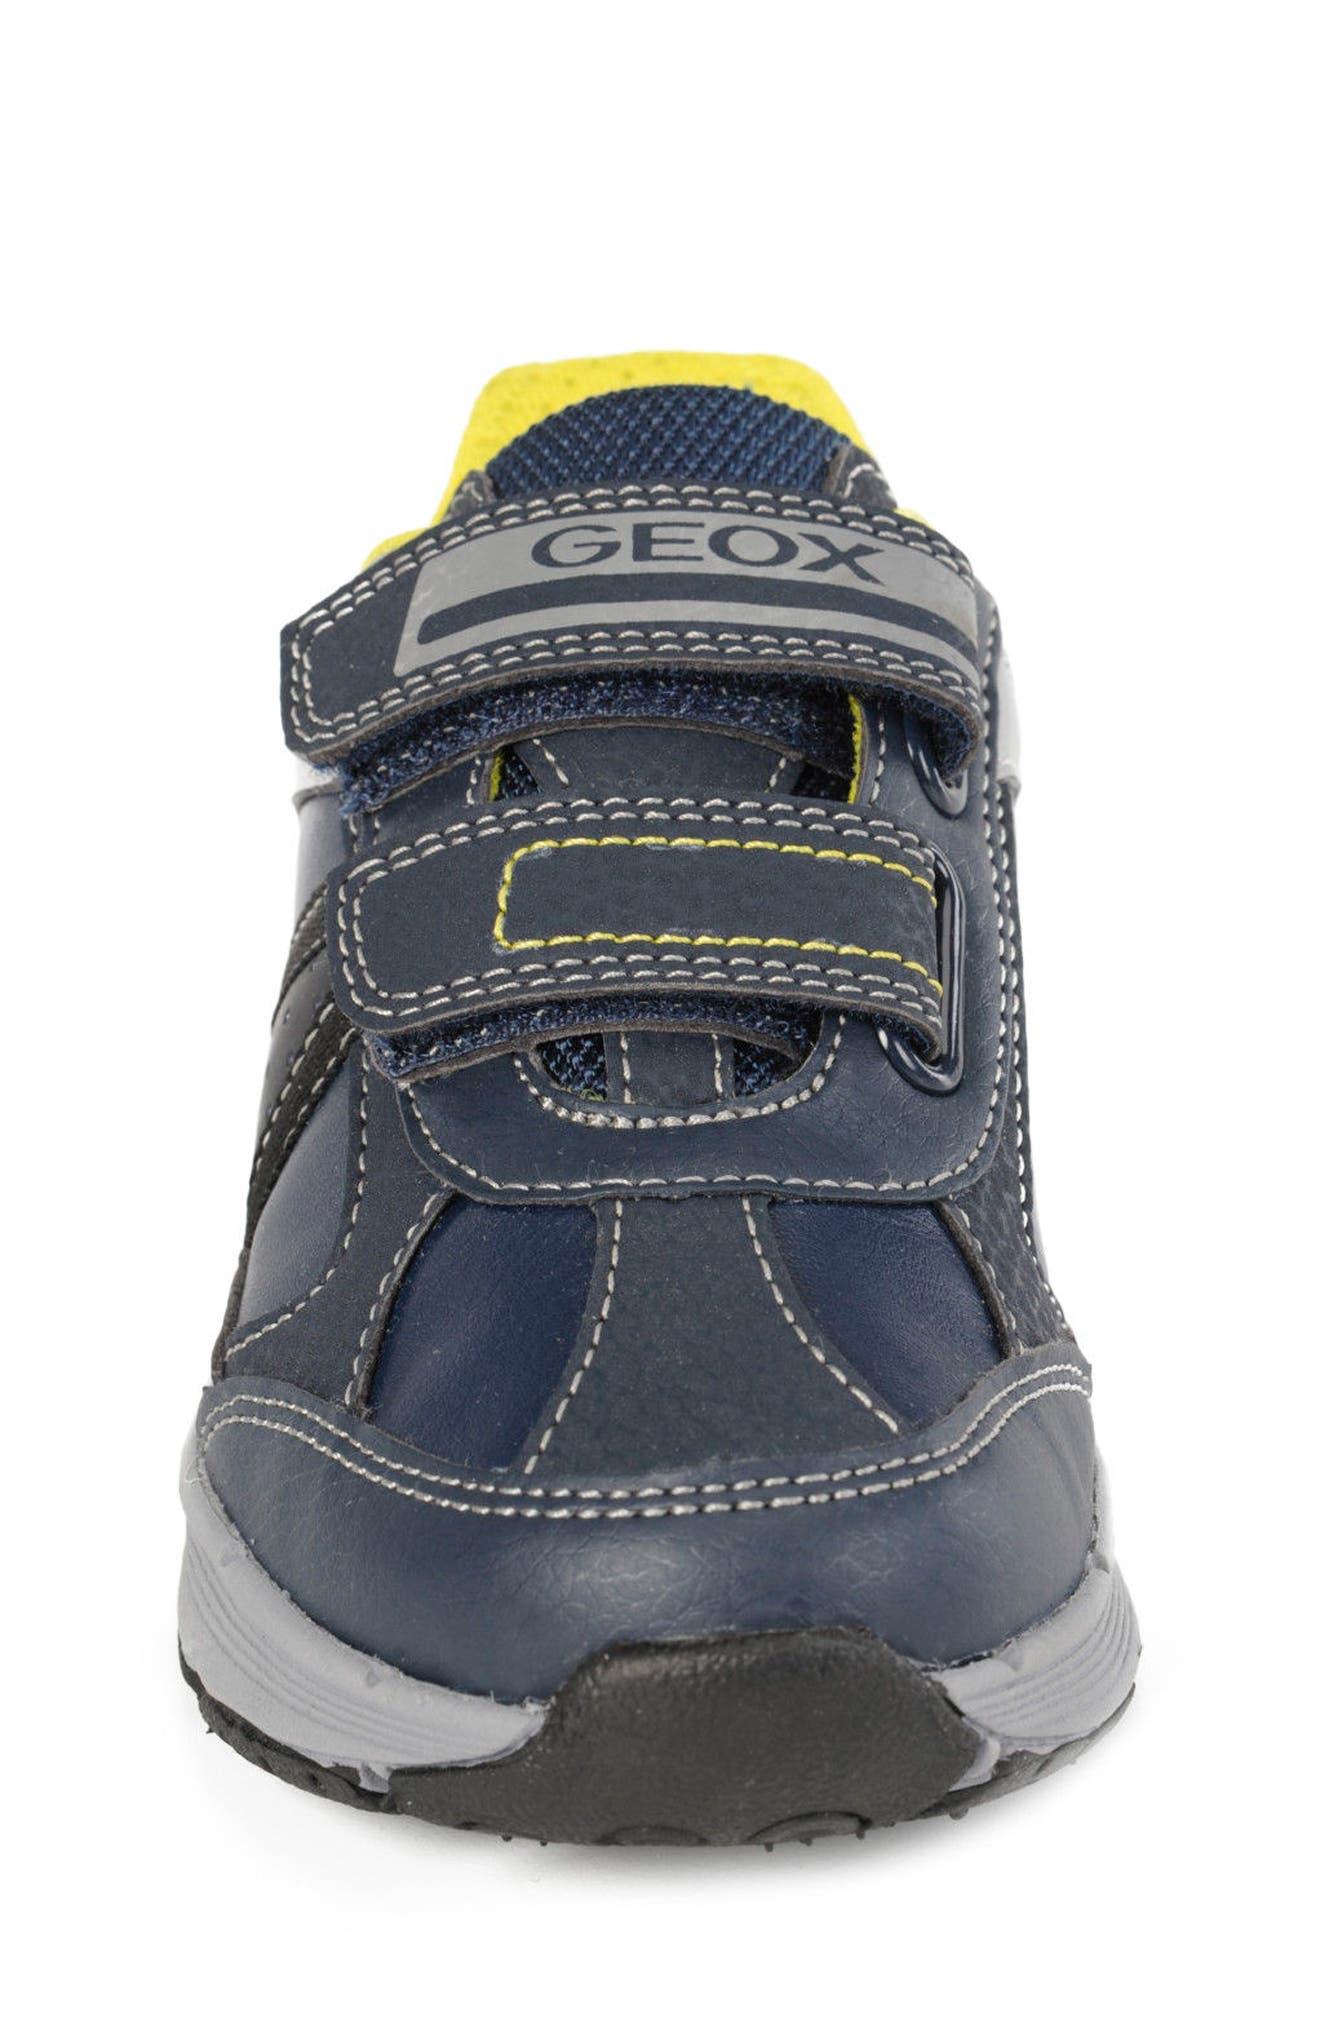 Top Fly Sneaker,                             Alternate thumbnail 4, color,                             Navy